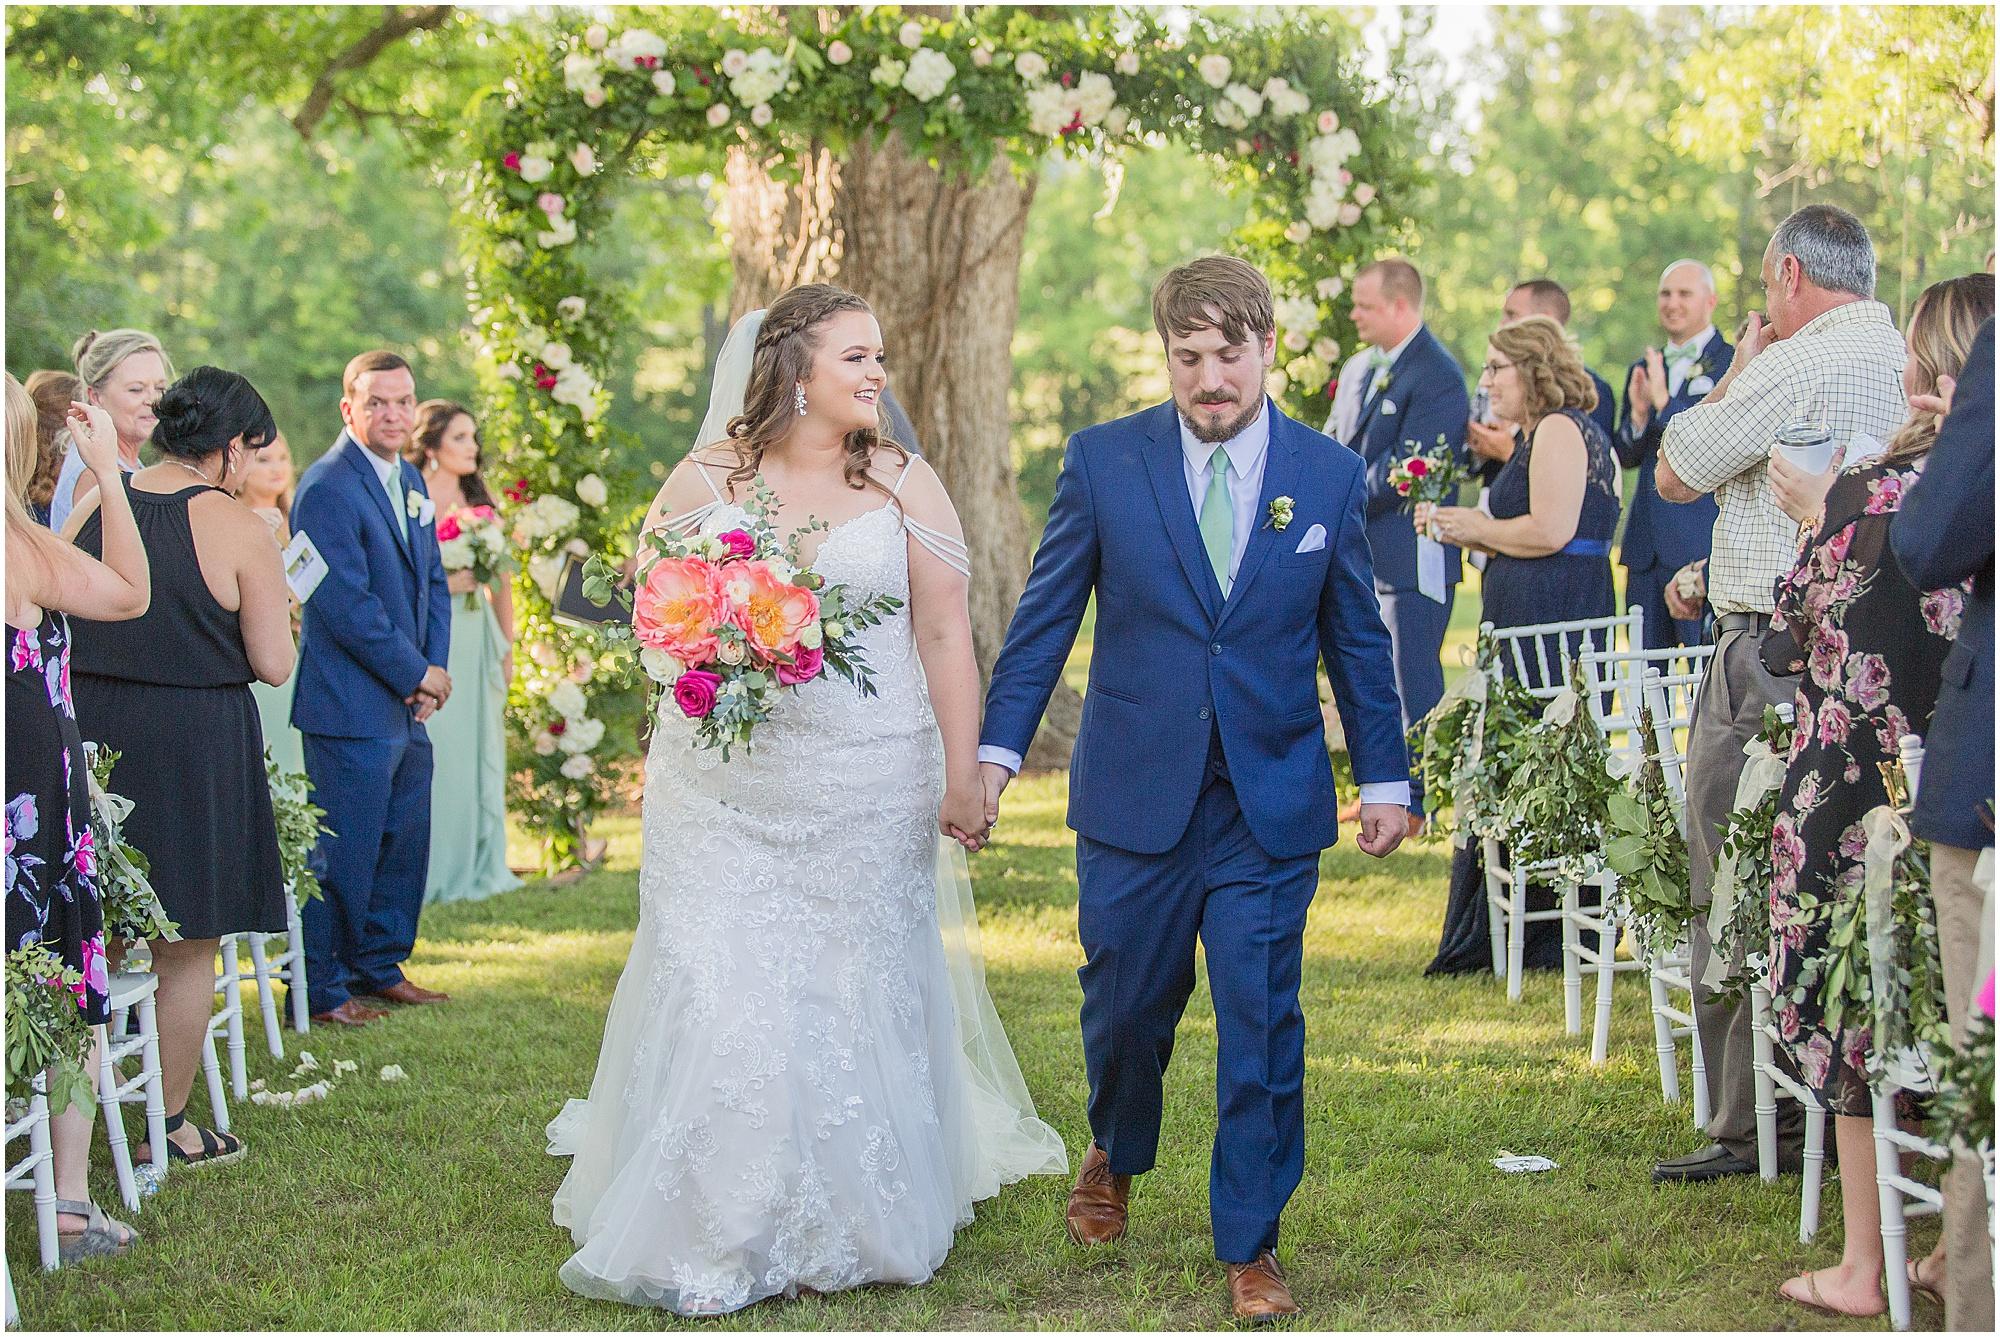 starkville-mississippi-wedding-page-place-dodson-farms_0066.jpg